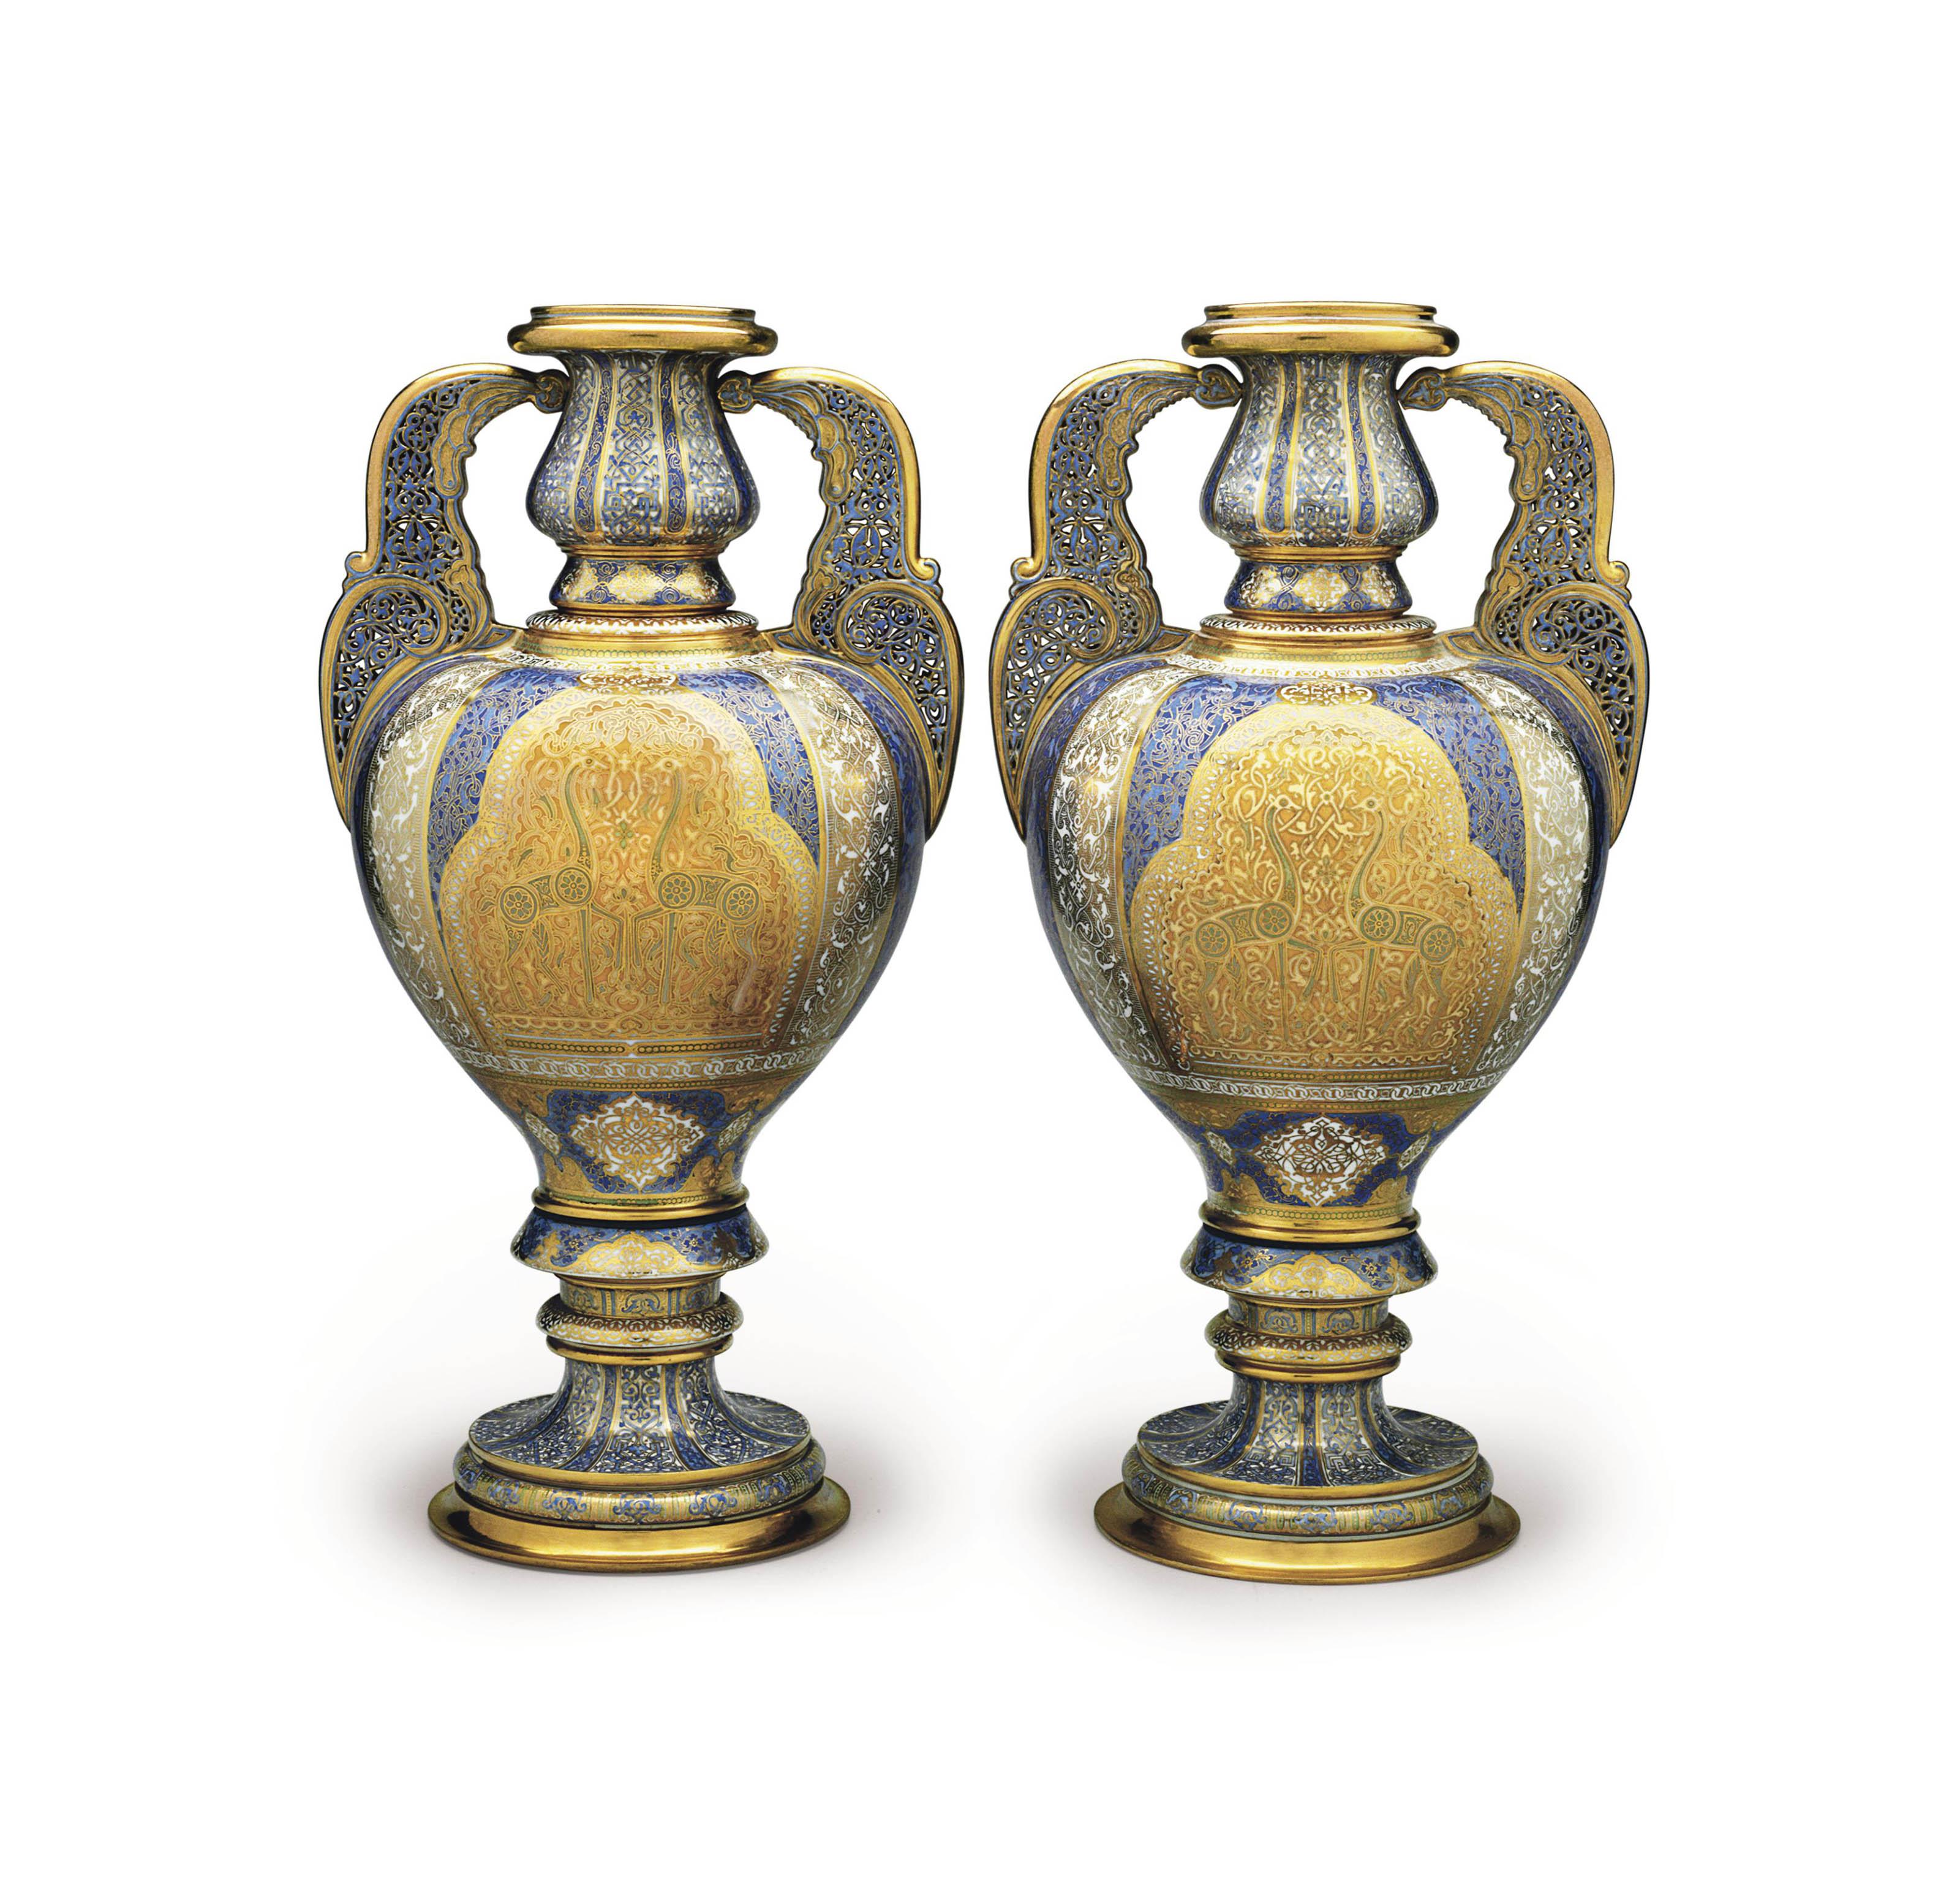 A PAIR OF SEVRES (LOUIS-PHILIPPE) PORCELAIN VASES (VASES 'ARABE FEUCHERE', 2EME GRANDEUR)